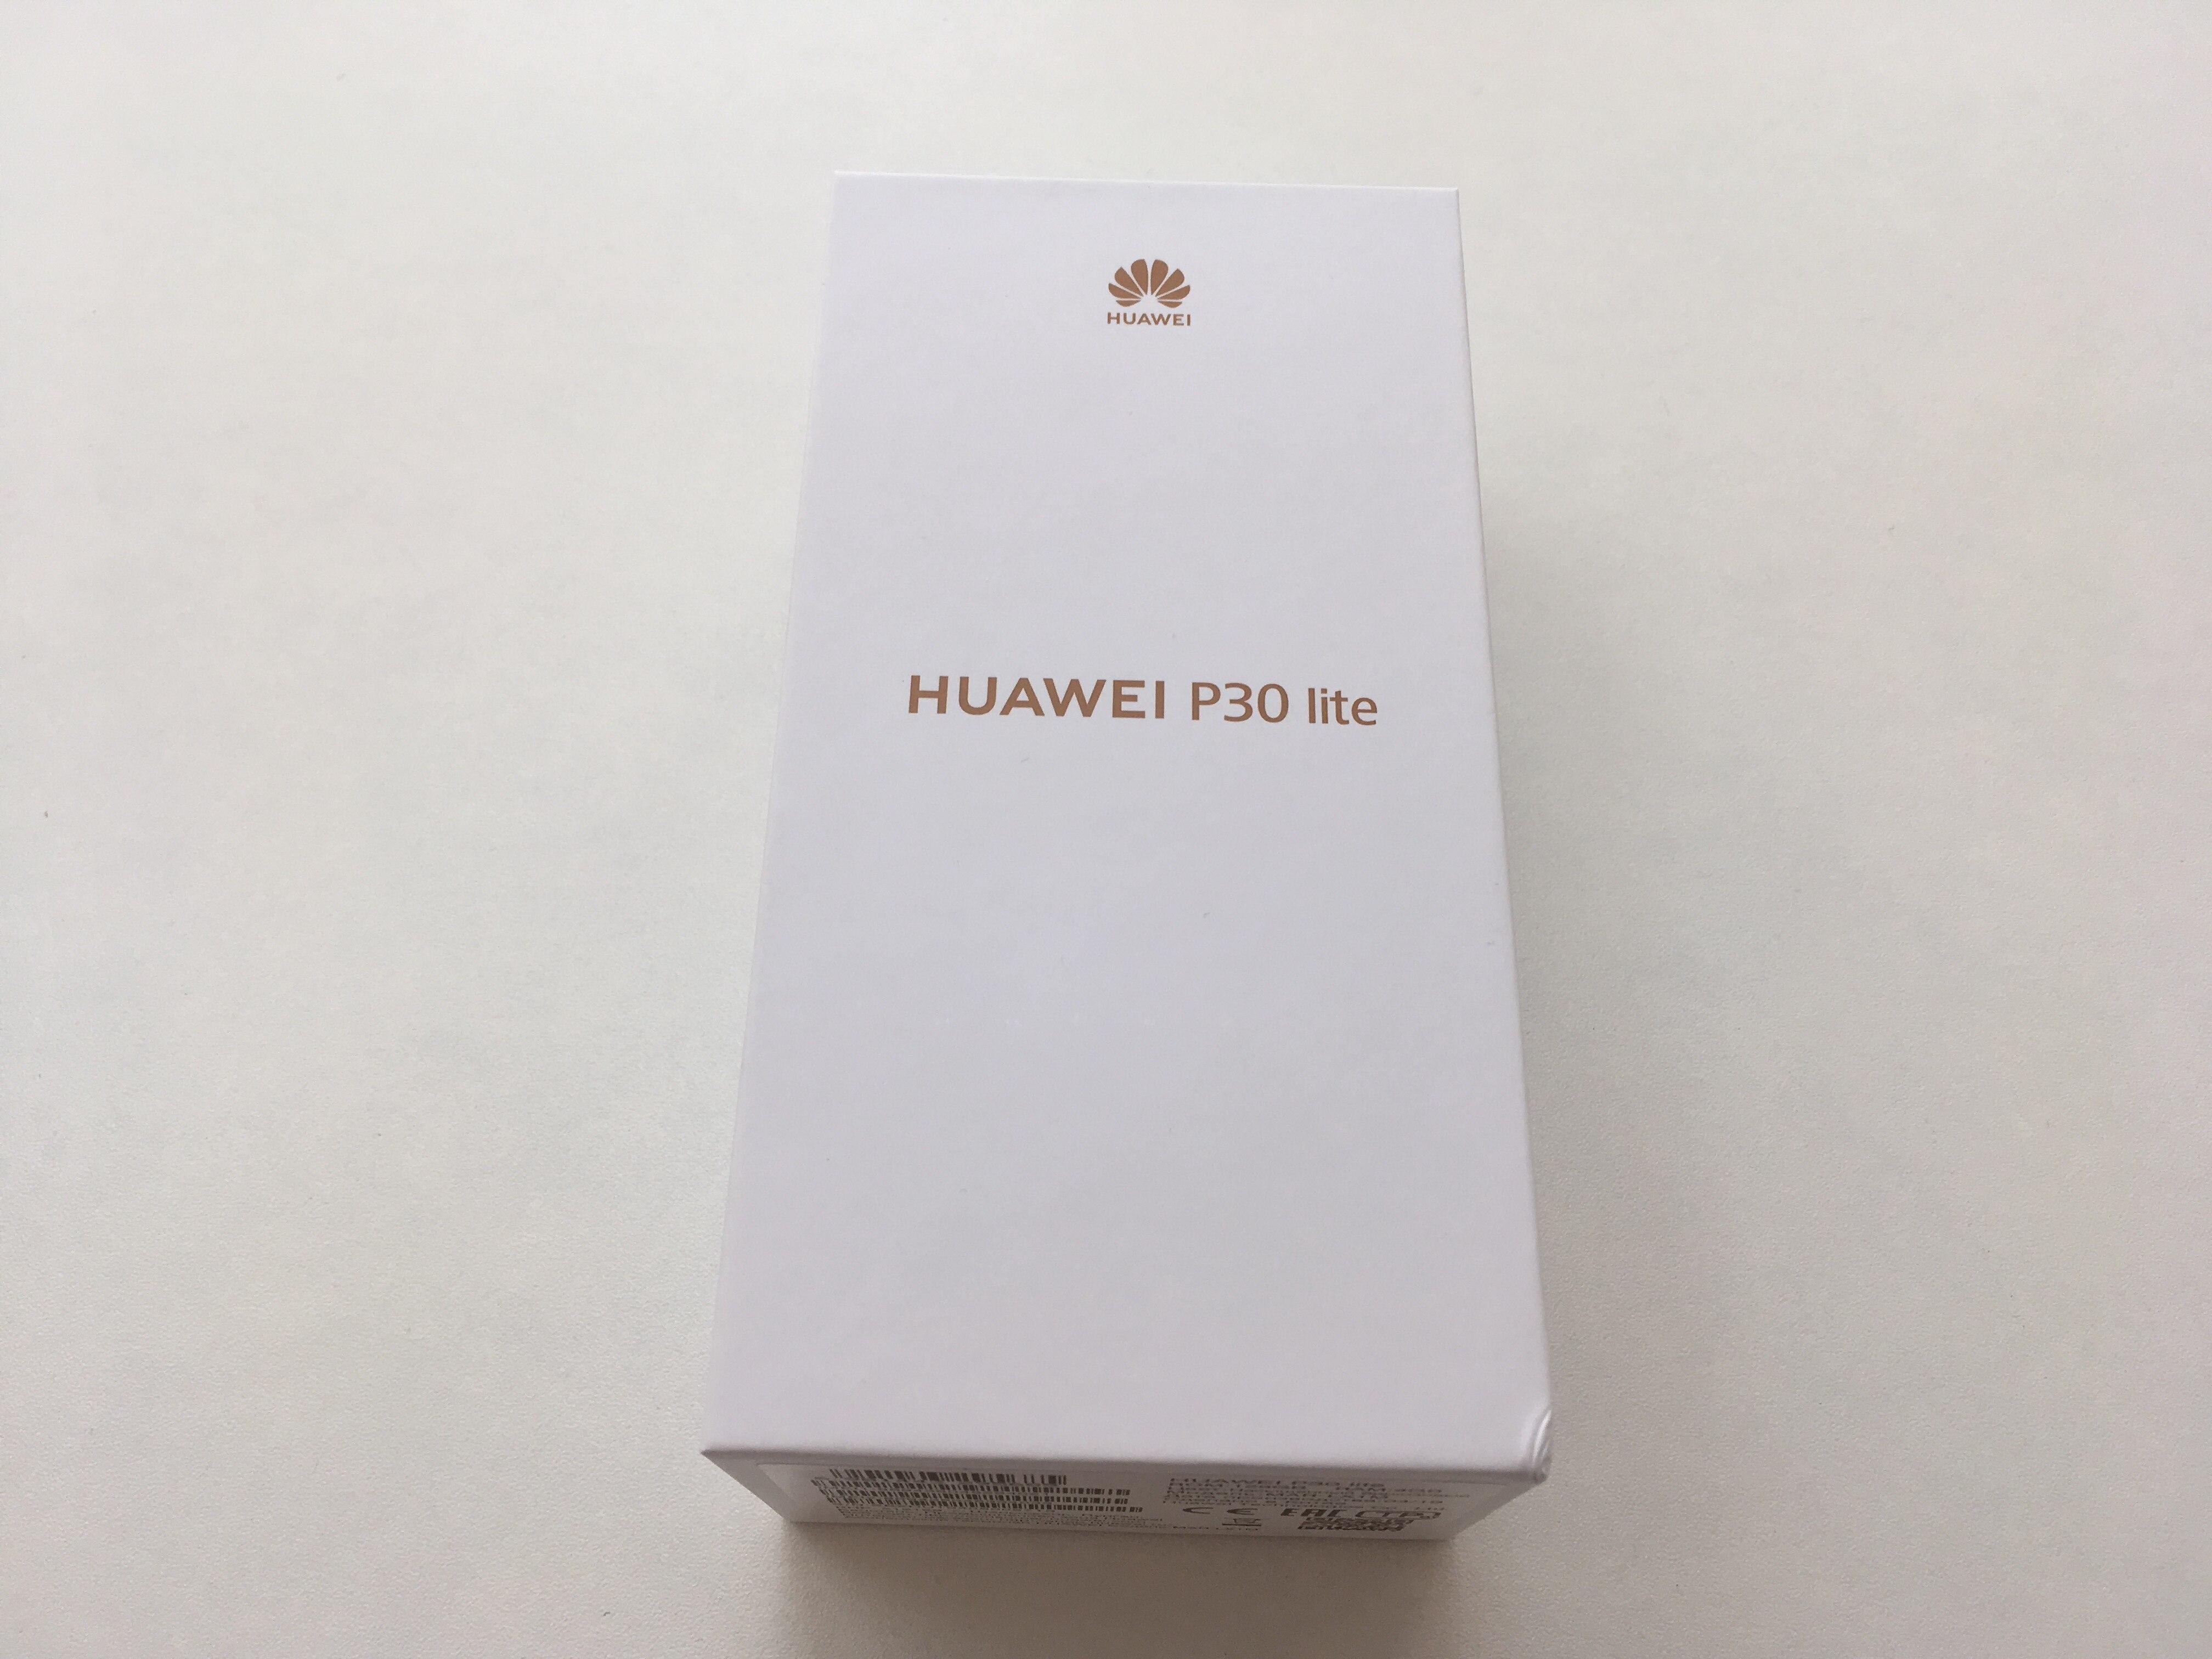 HUAWEI P30 lite 128ГБ. Скидка 4400 руб. будет автоматически применена в корзине